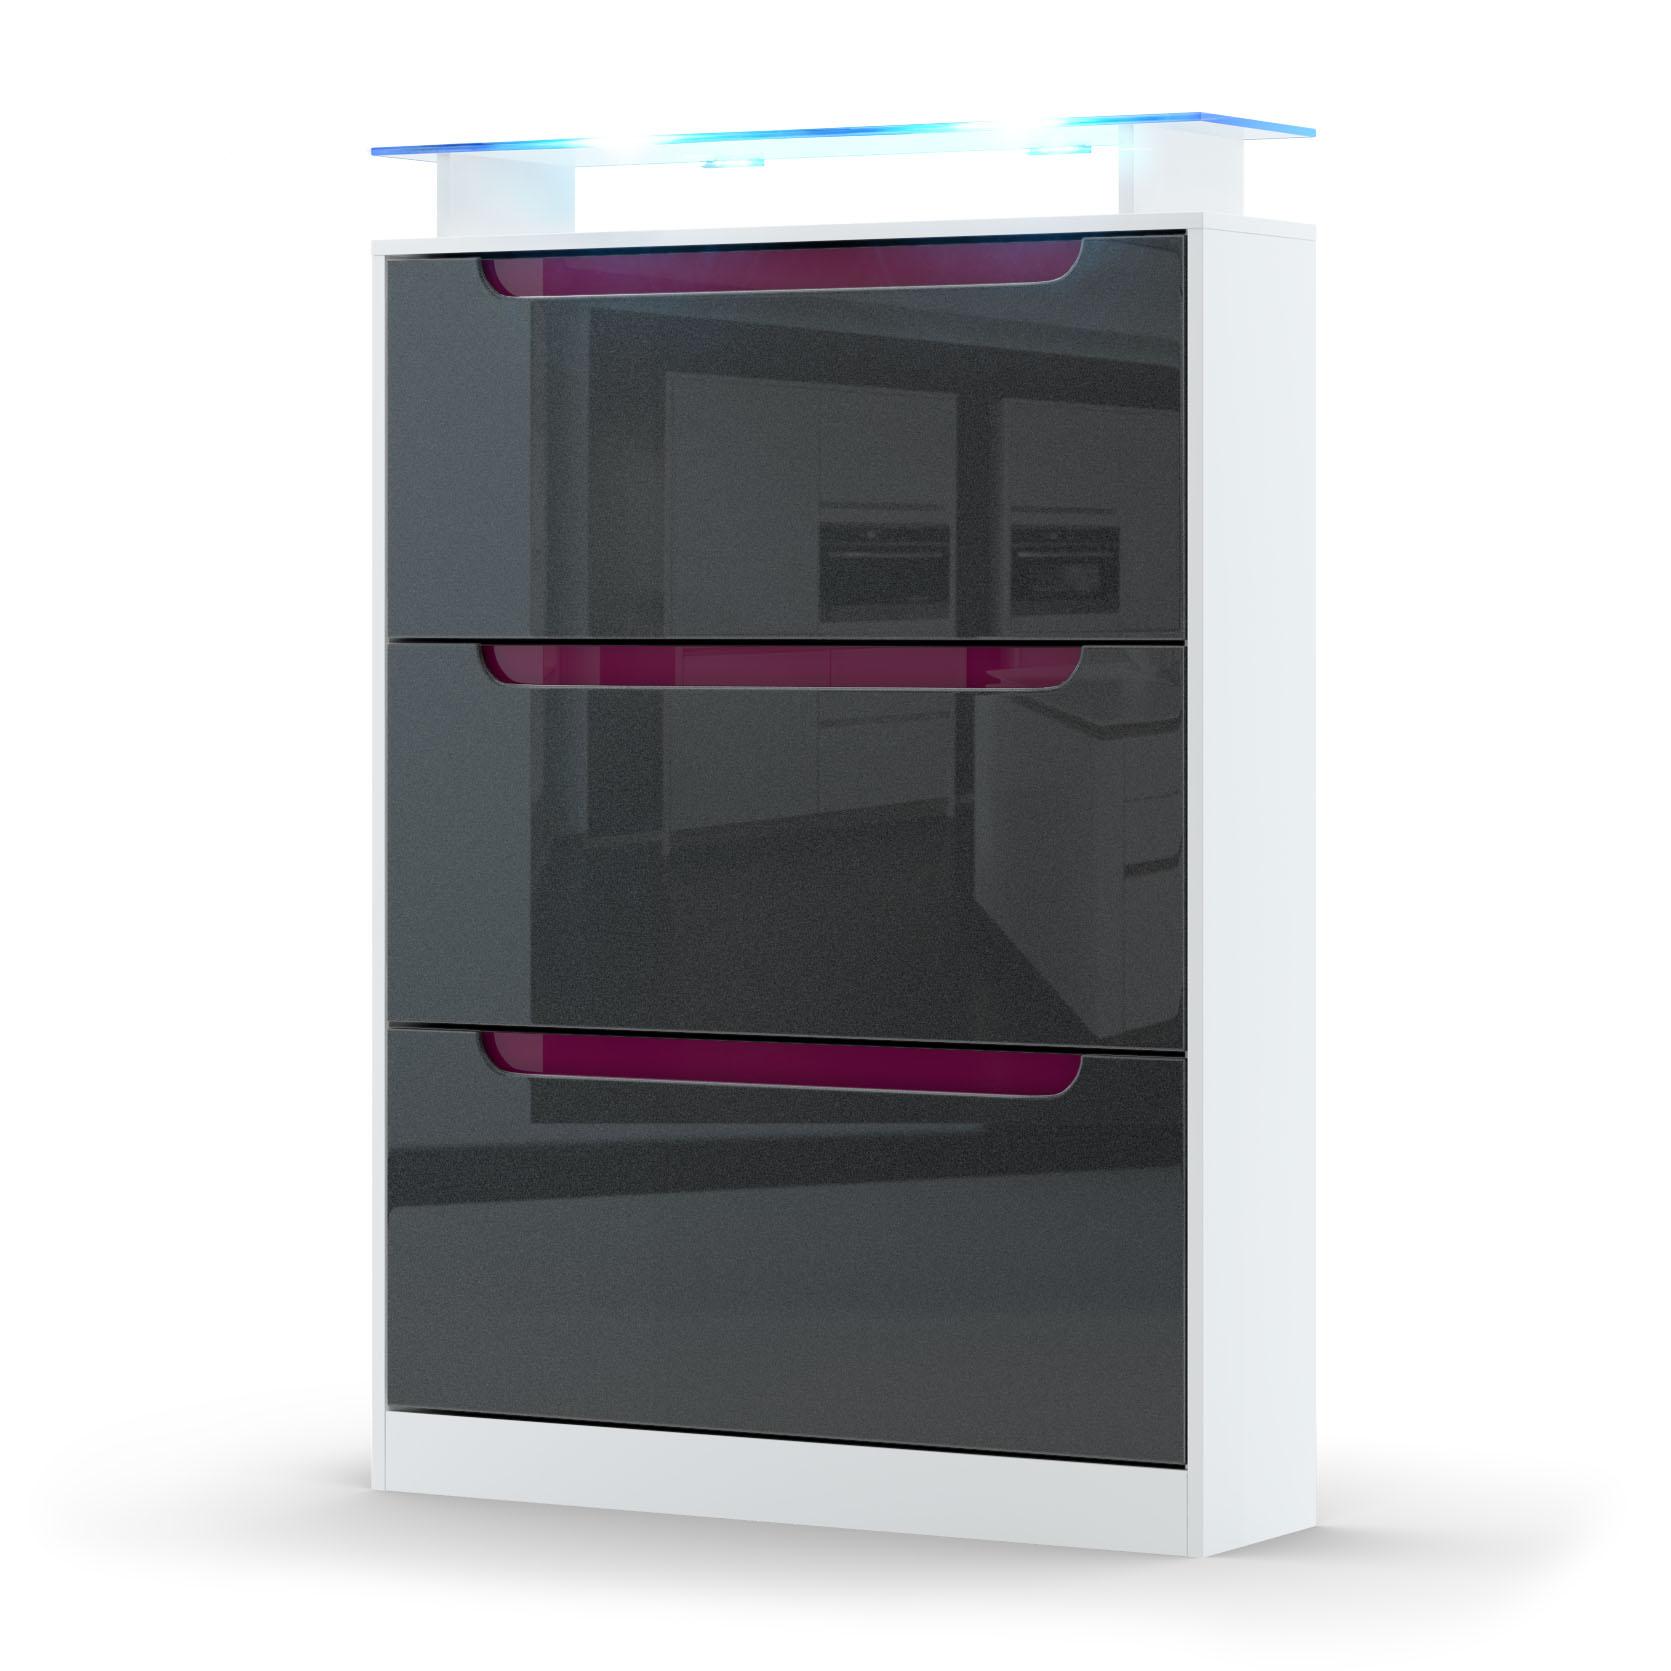 schuhschrank schuhkipper dielen flur schrank m bel regal. Black Bedroom Furniture Sets. Home Design Ideas